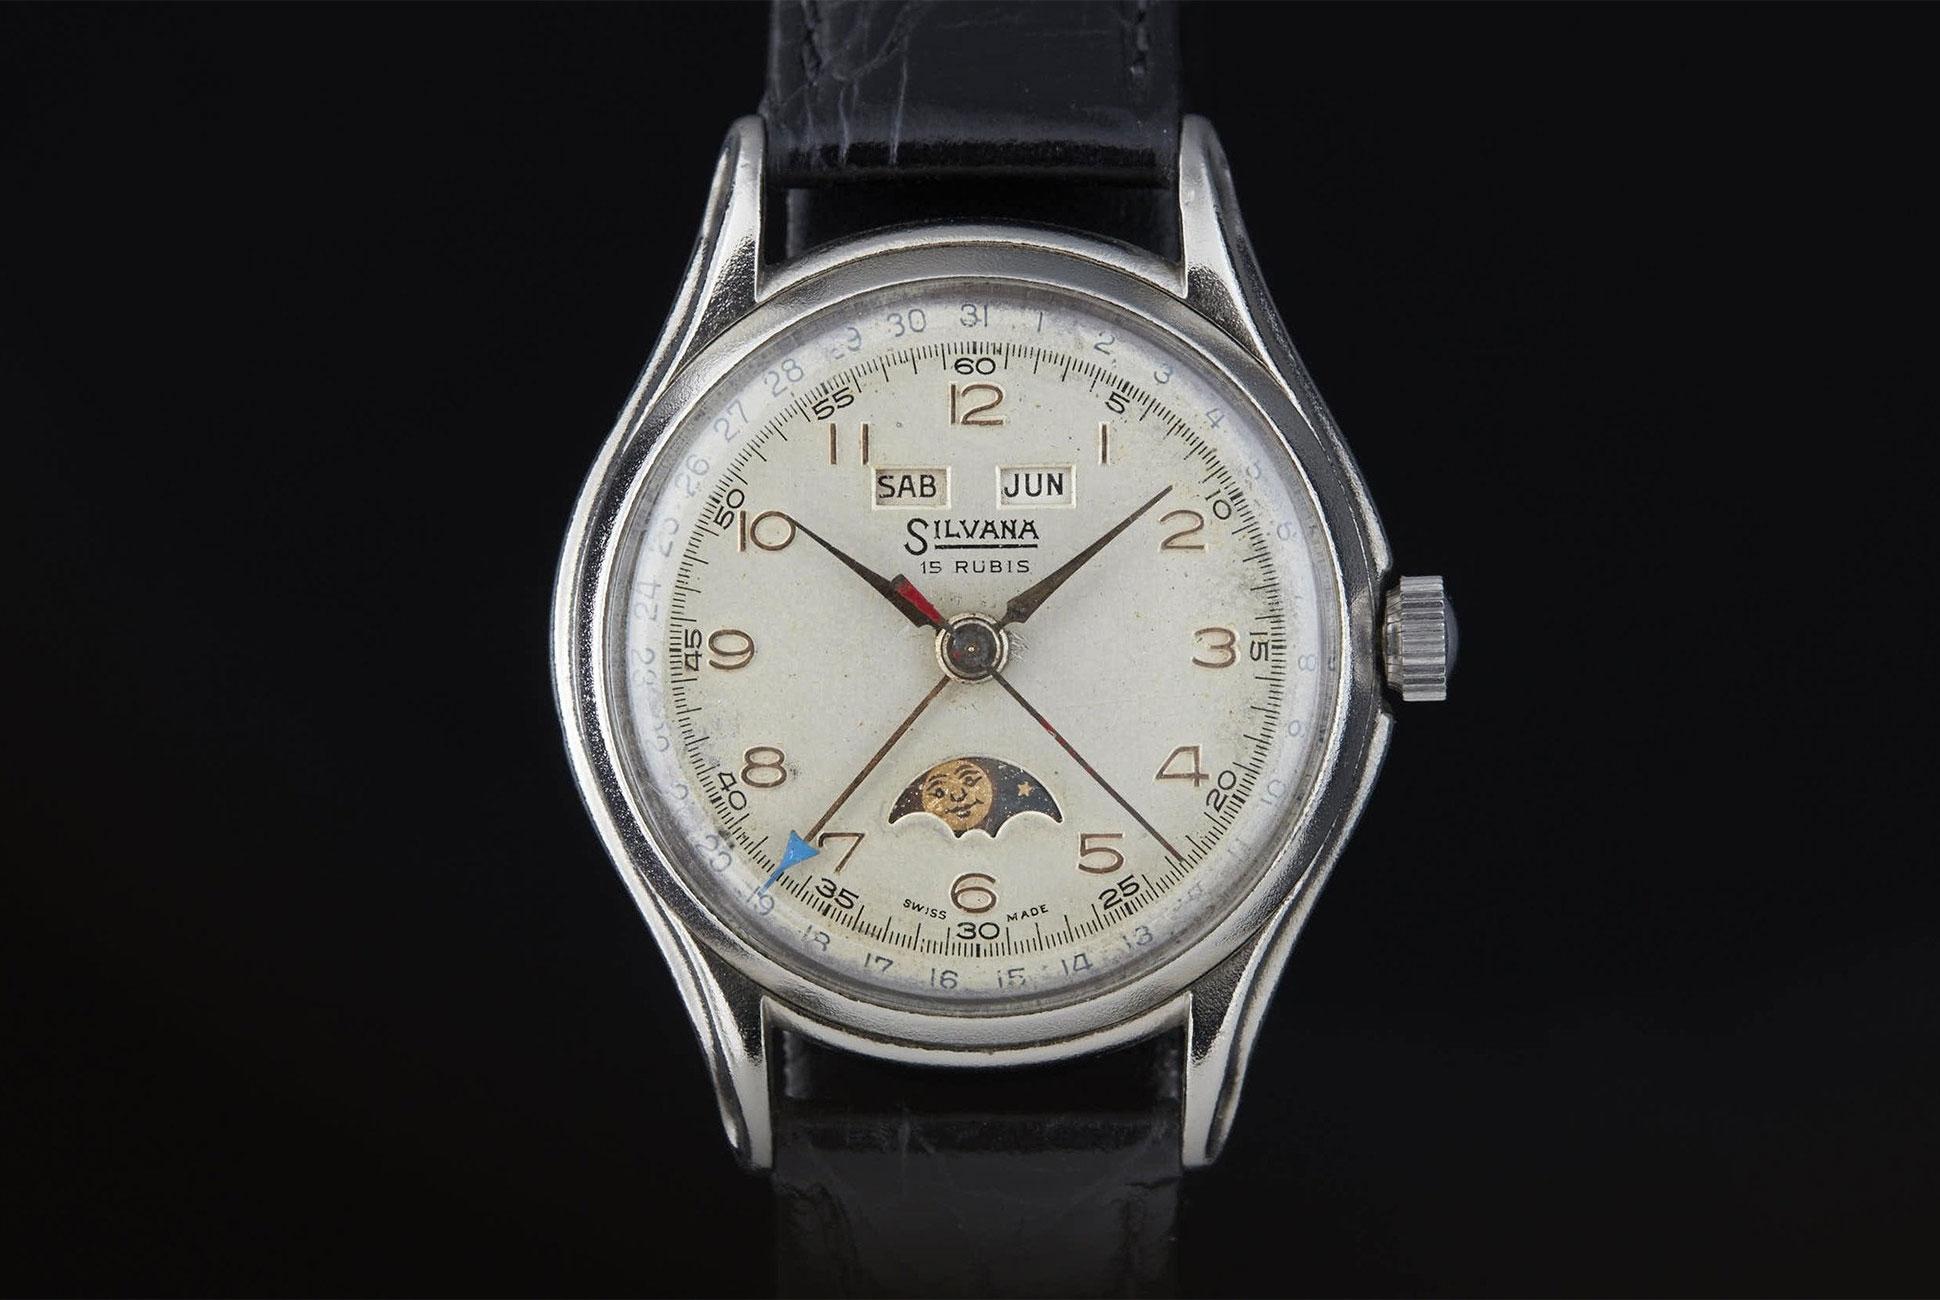 Found: 3 Vintage Triple Date Calendar Watches - Gear Patrol